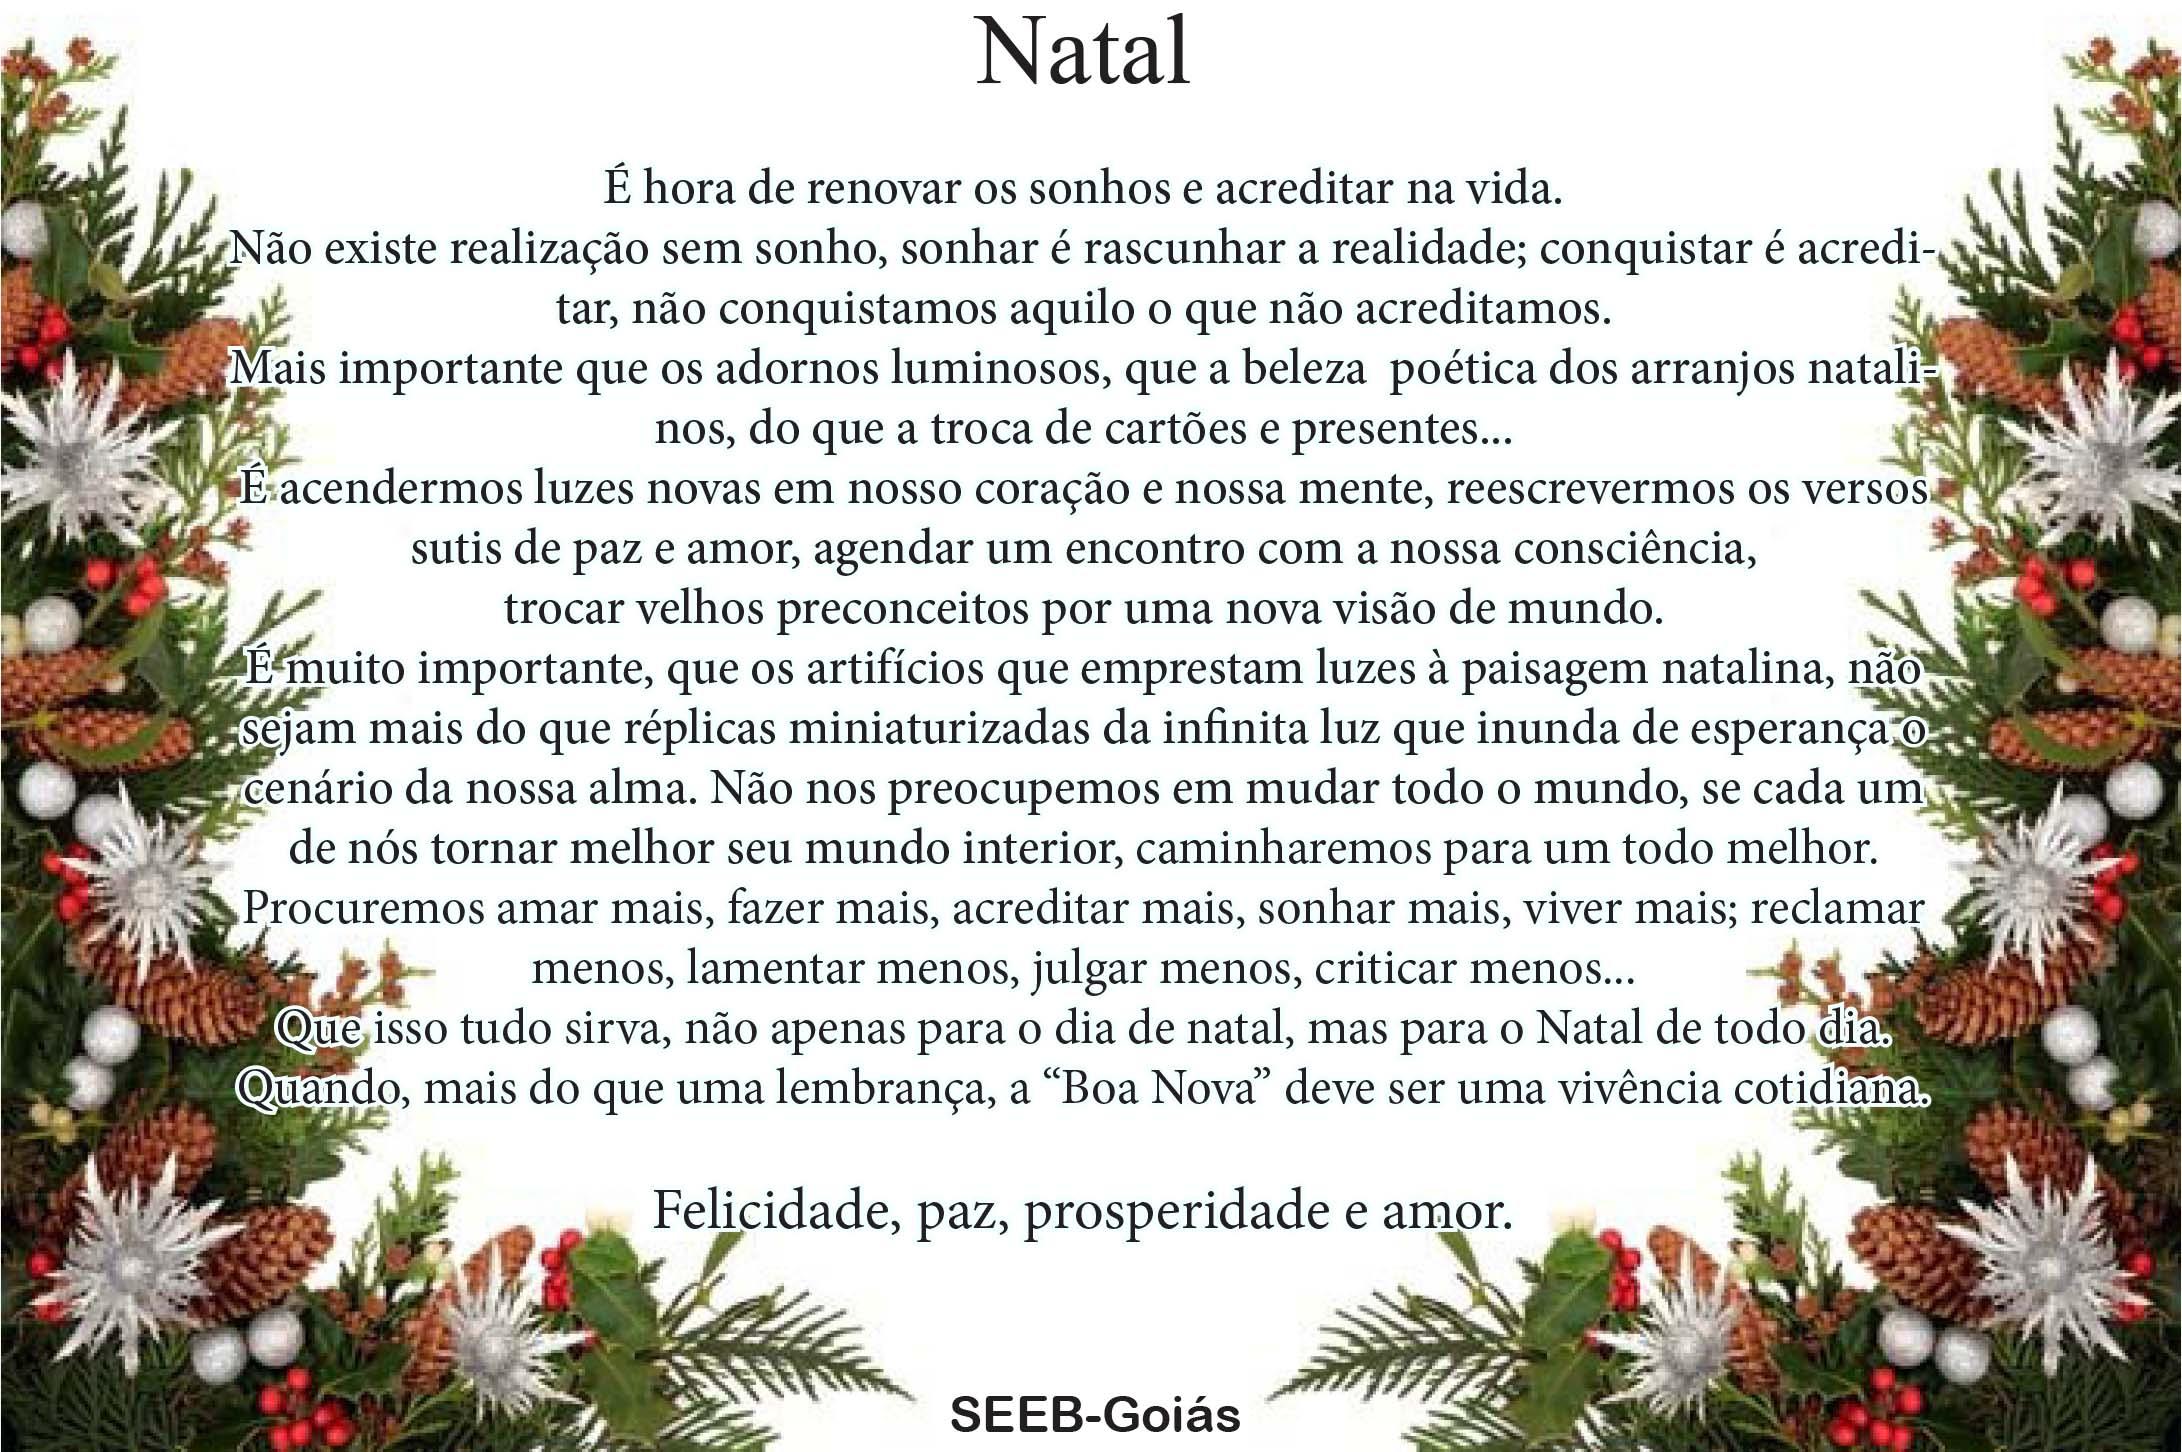 natal-4168178.jpg